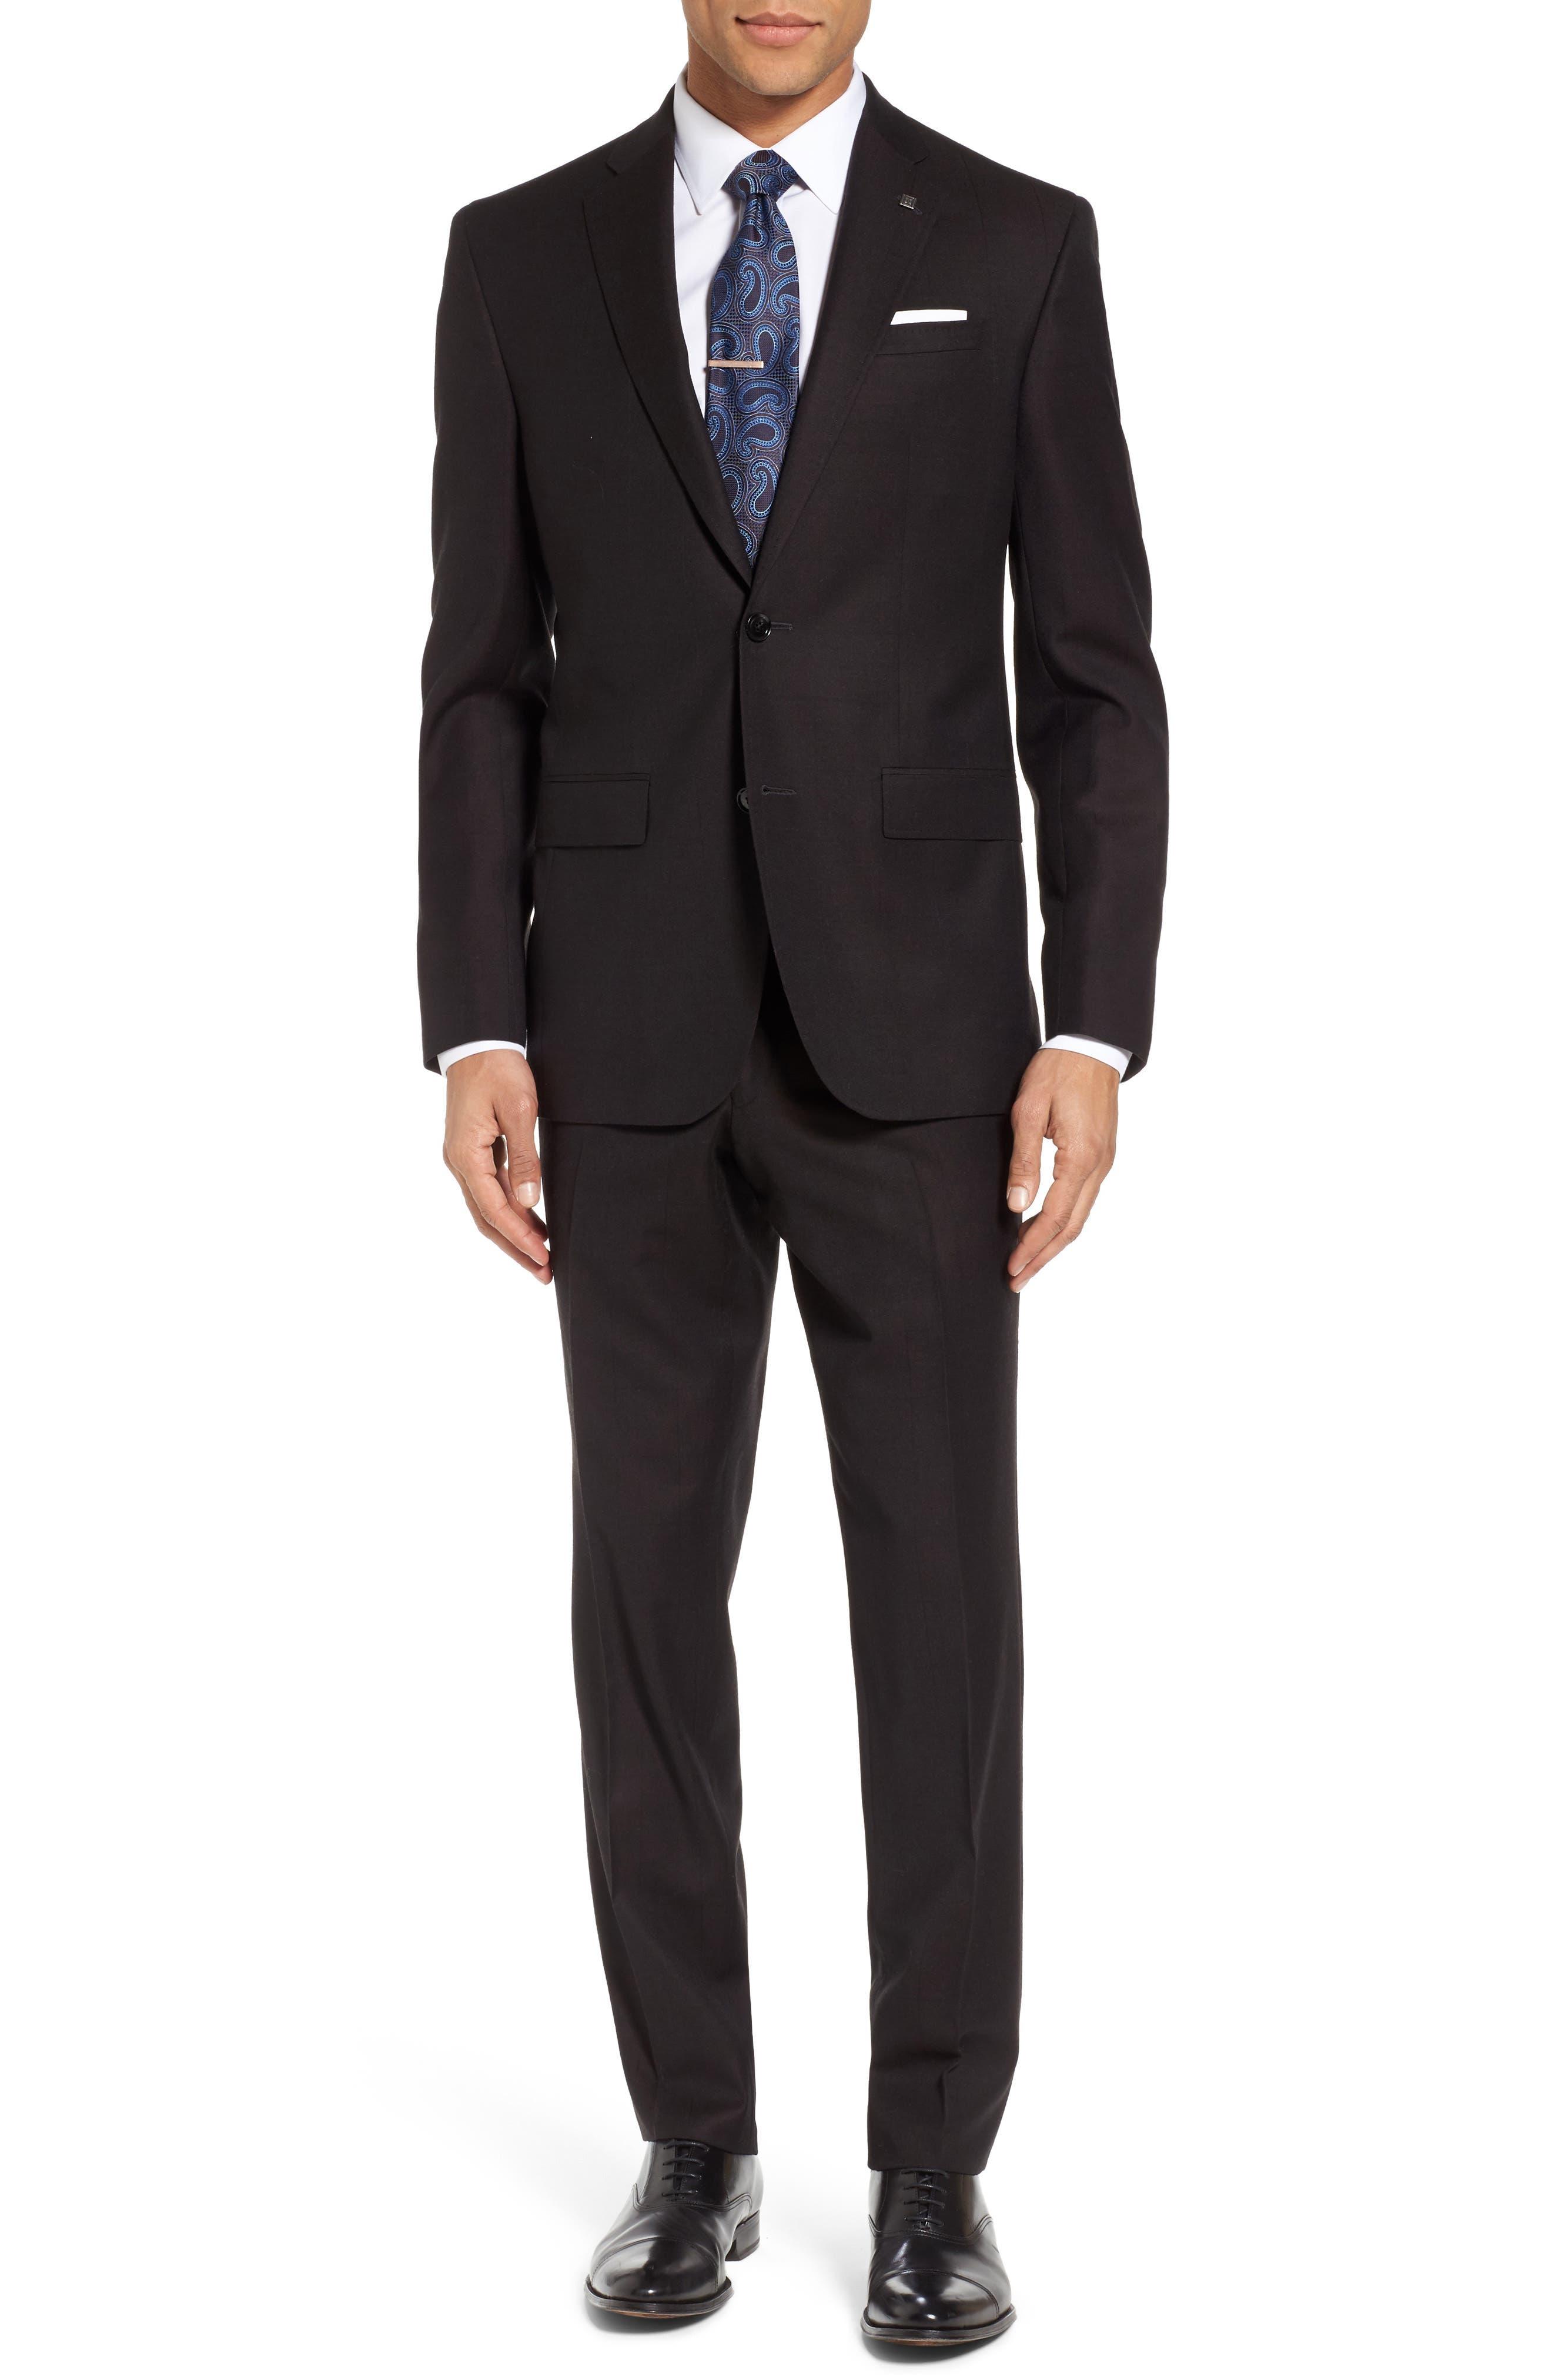 Jay Trim Fit Solid Wool Suit,                             Main thumbnail 1, color,                             200